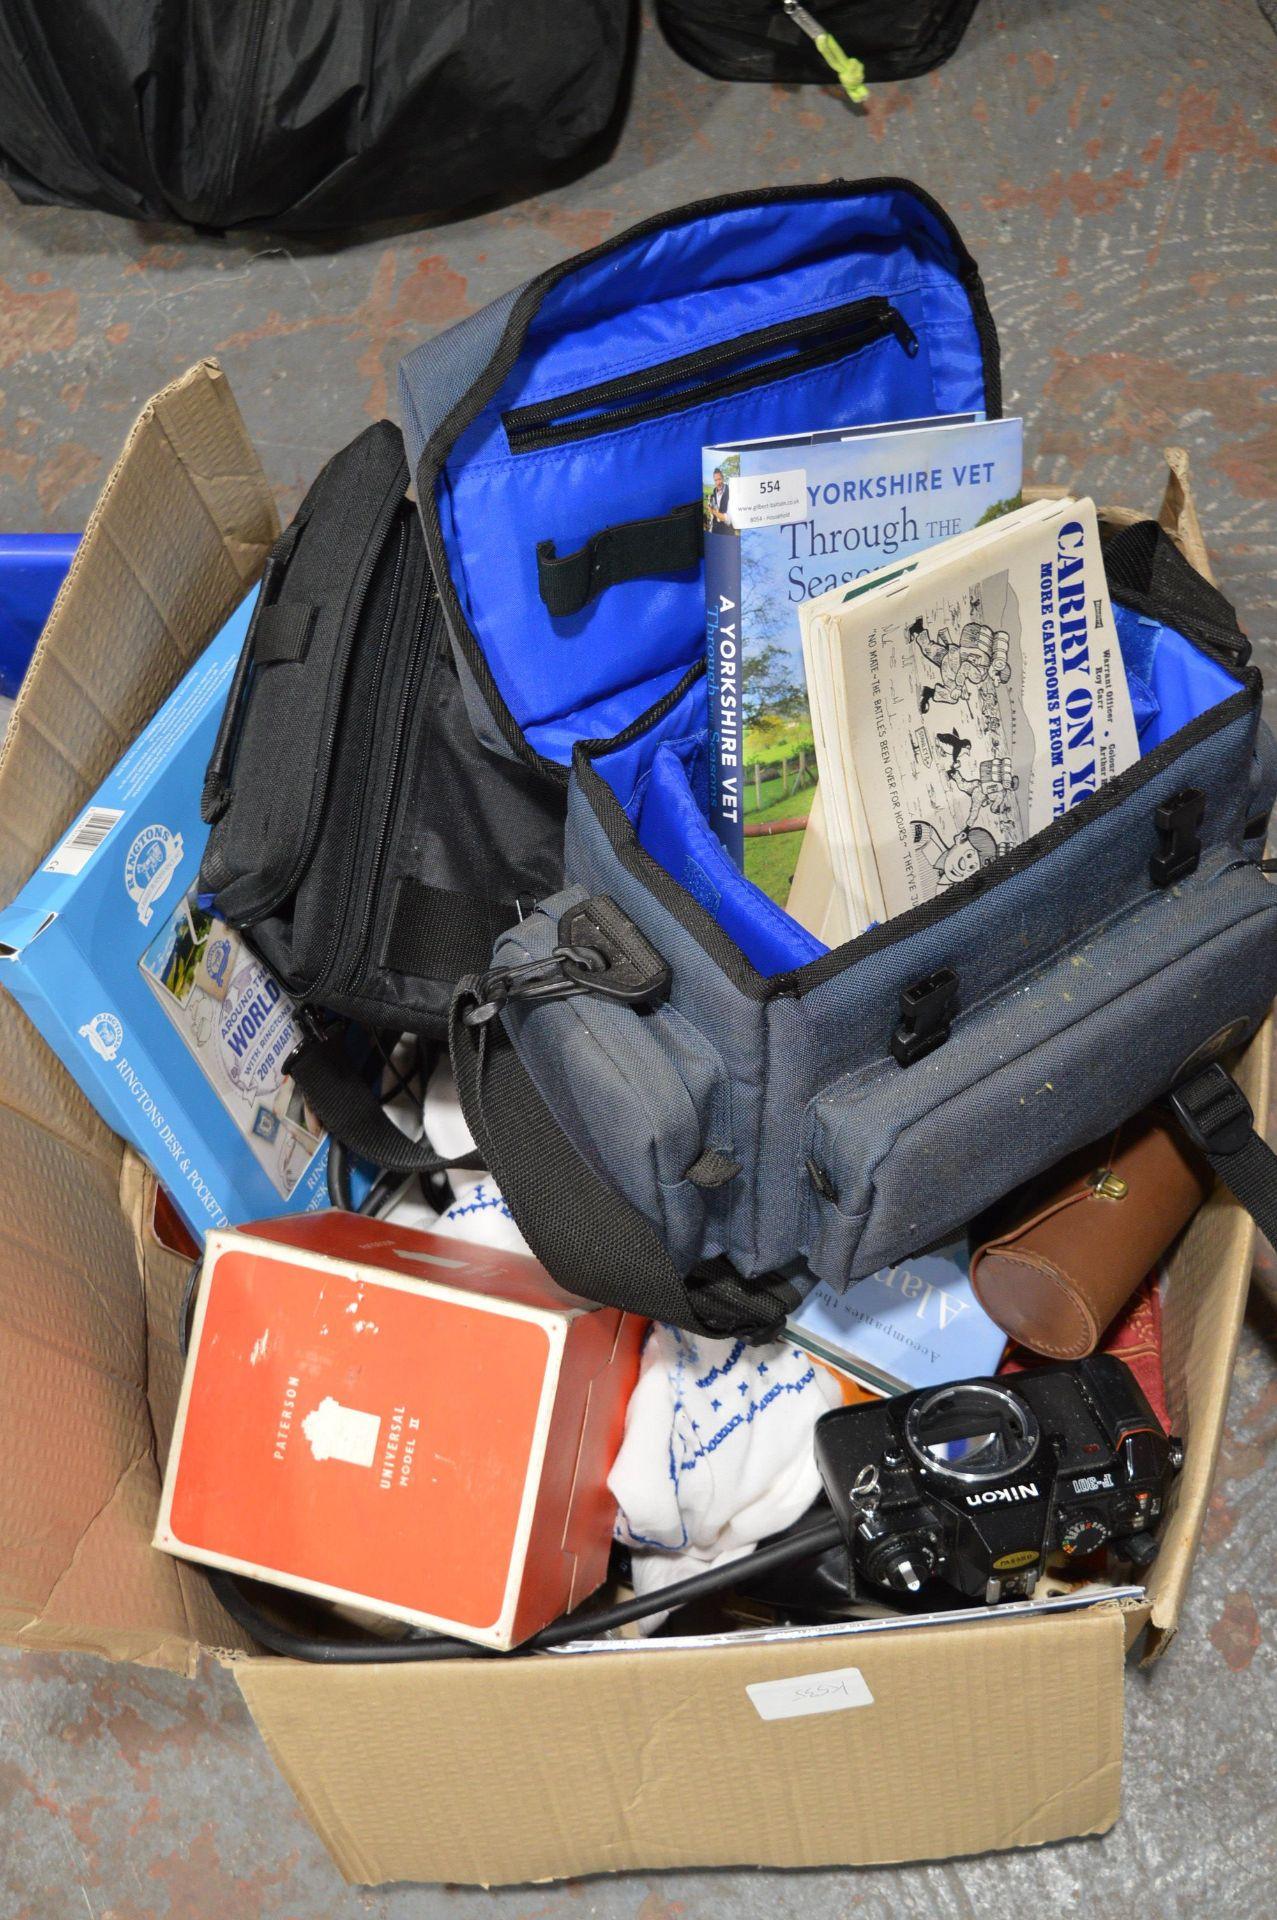 Lot 554 - Box Containing Assorted Camera Bags, Binoculars, N